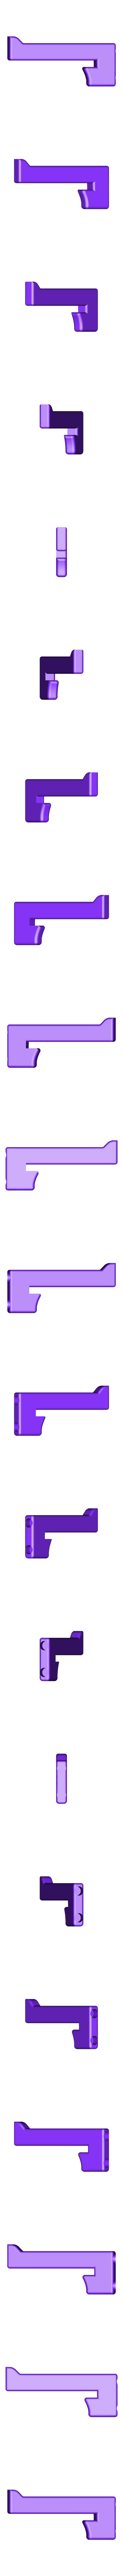 trigger.stl Download free STL file Foam Dart GUN (pullback loading) • 3D print design, senns